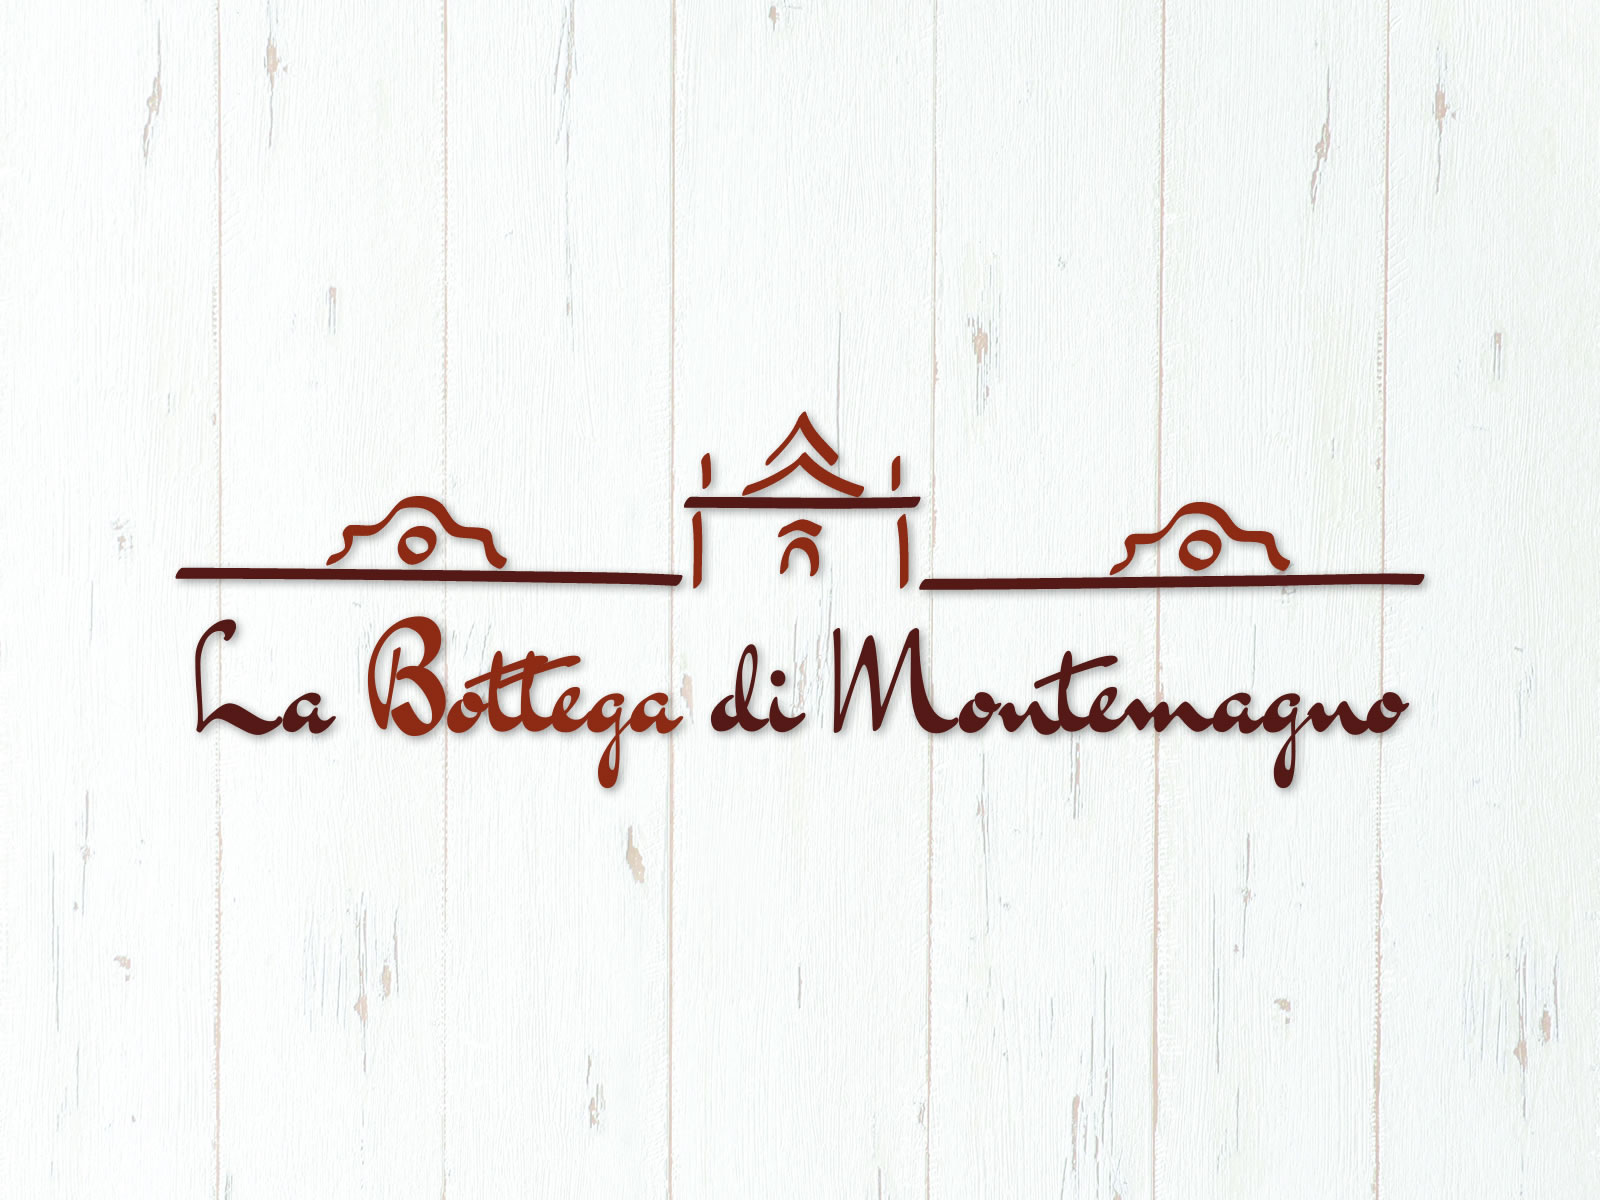 La Bottega di Montemagno - Logo